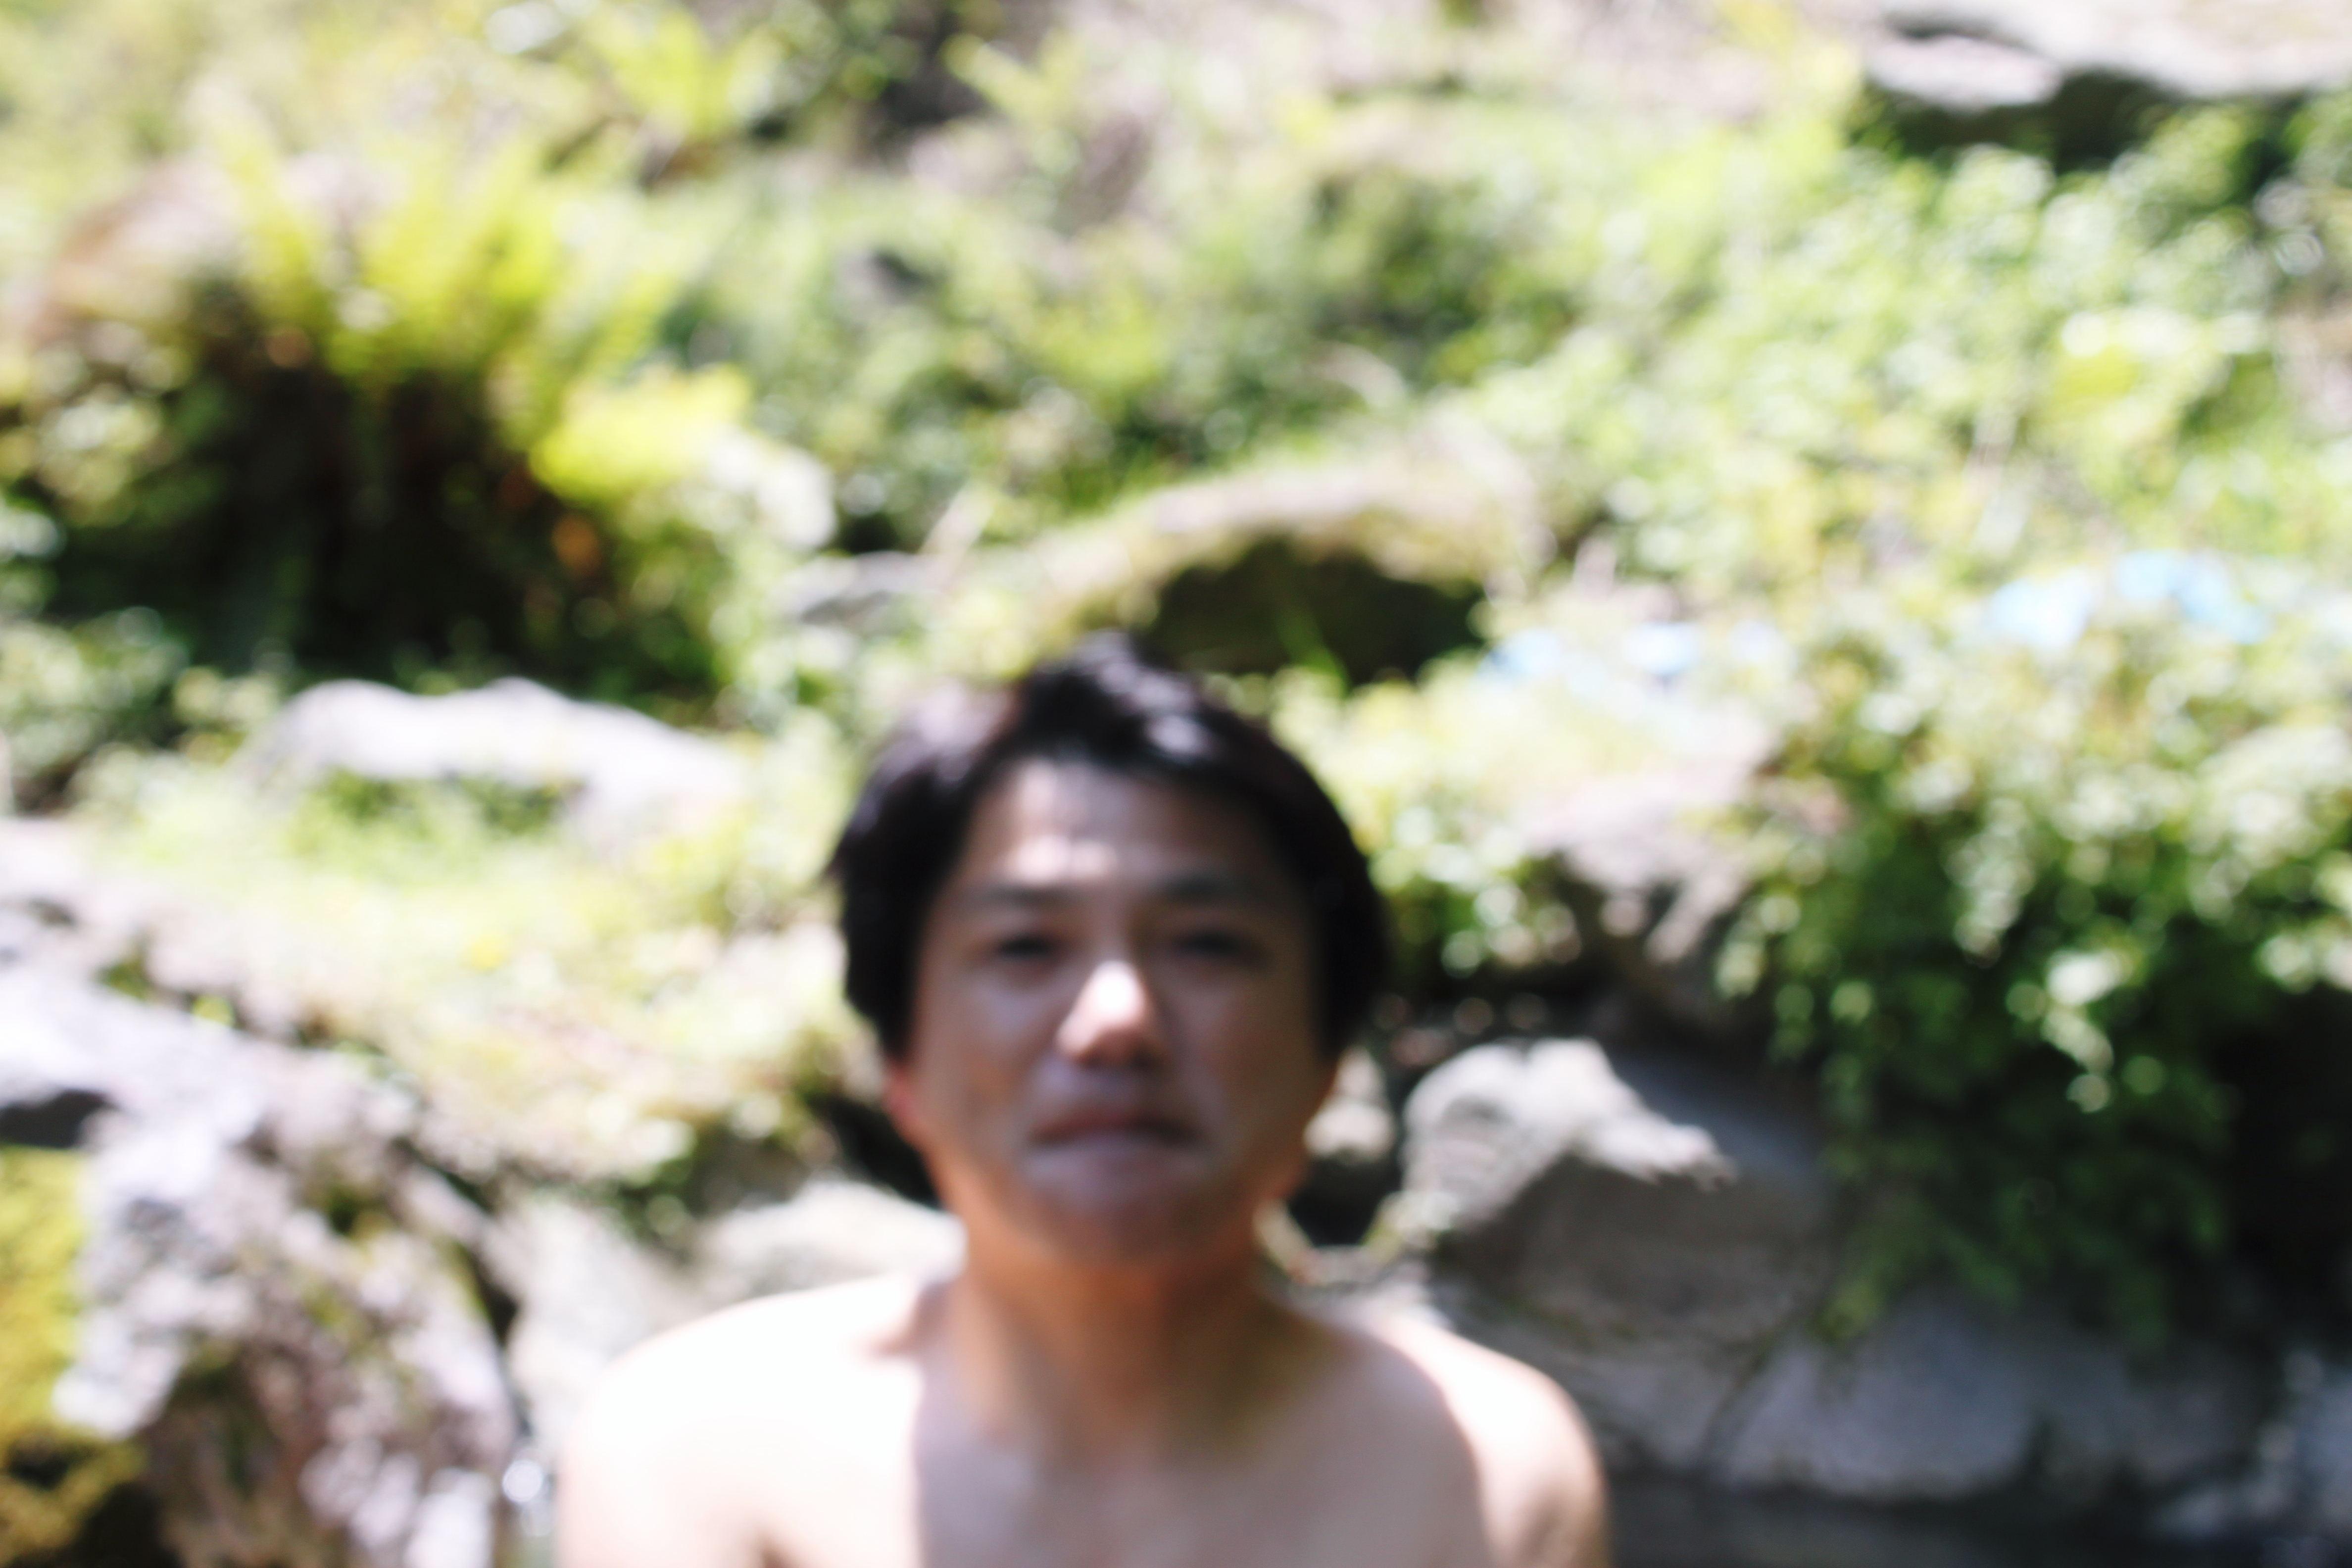 殺人 湯 へ びん 【Yahoo論壇/廖元豪】湯景華縱火殺人不判死刑,別牽扯兩公約